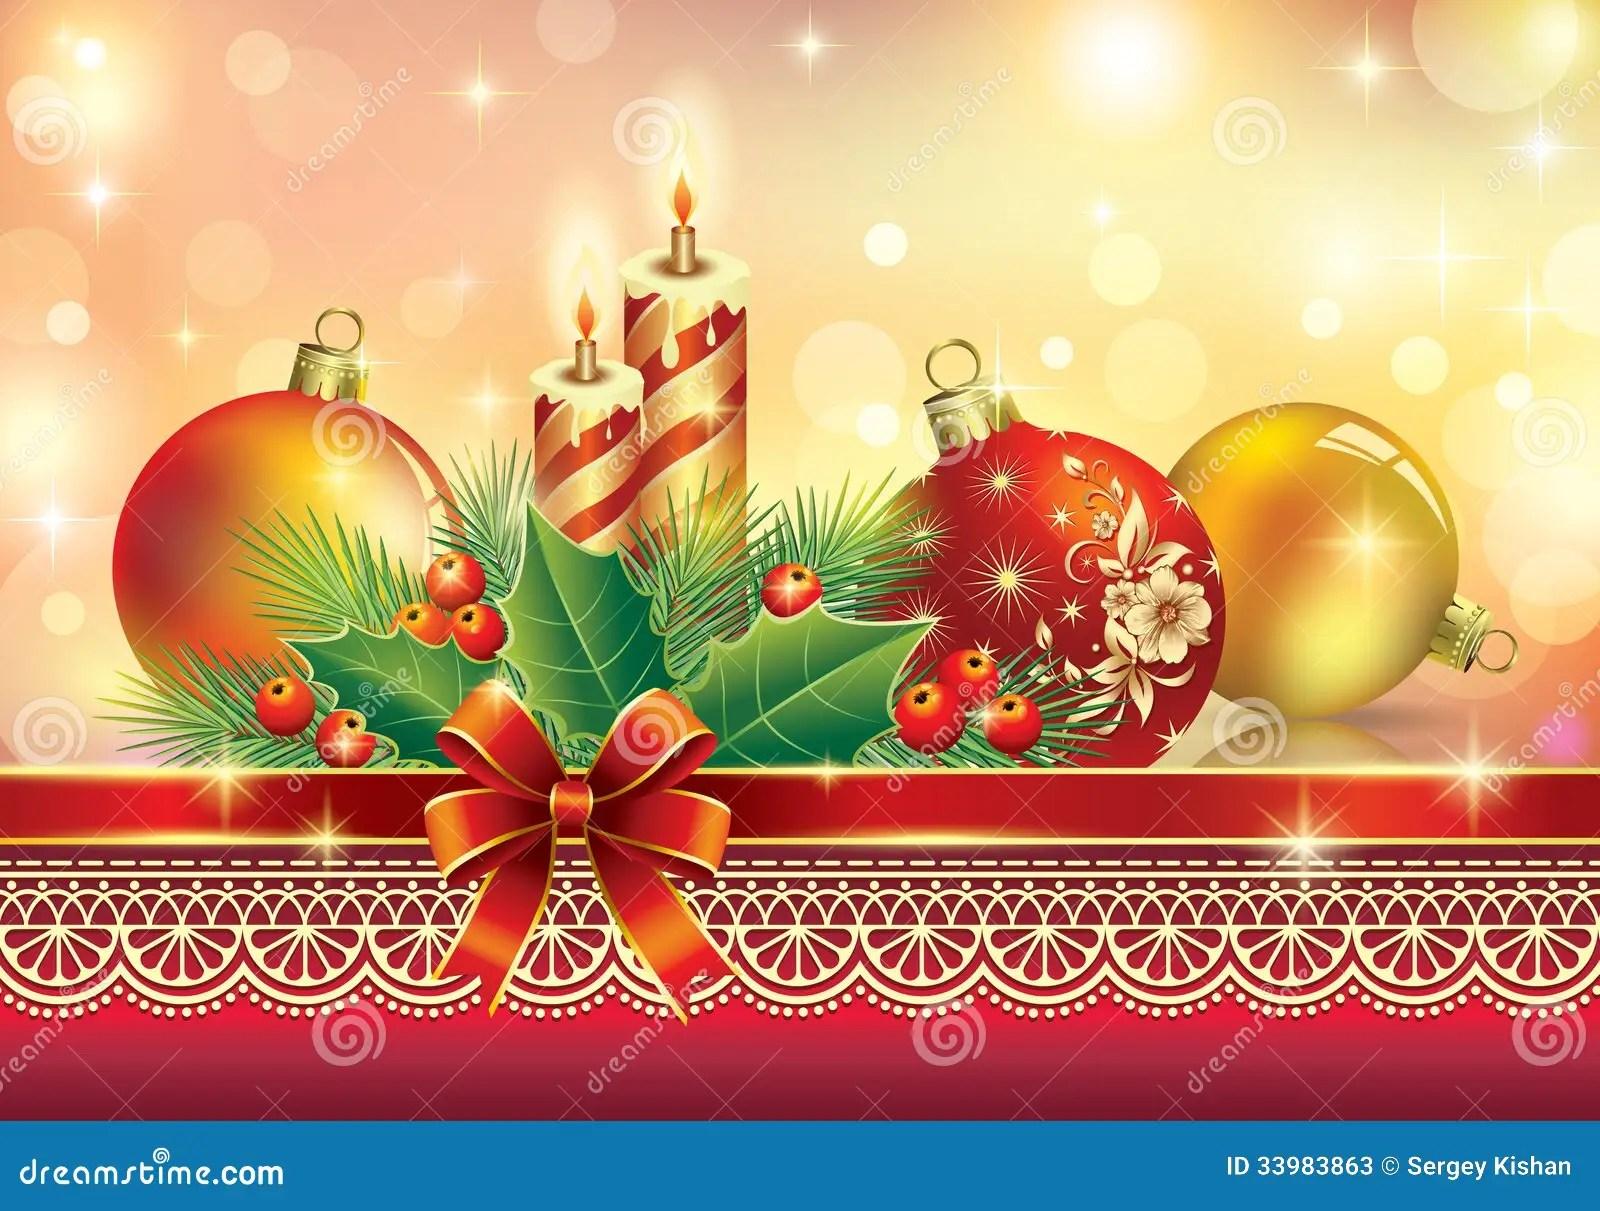 Christmas Greeting Card Stock Photos Image 33983863